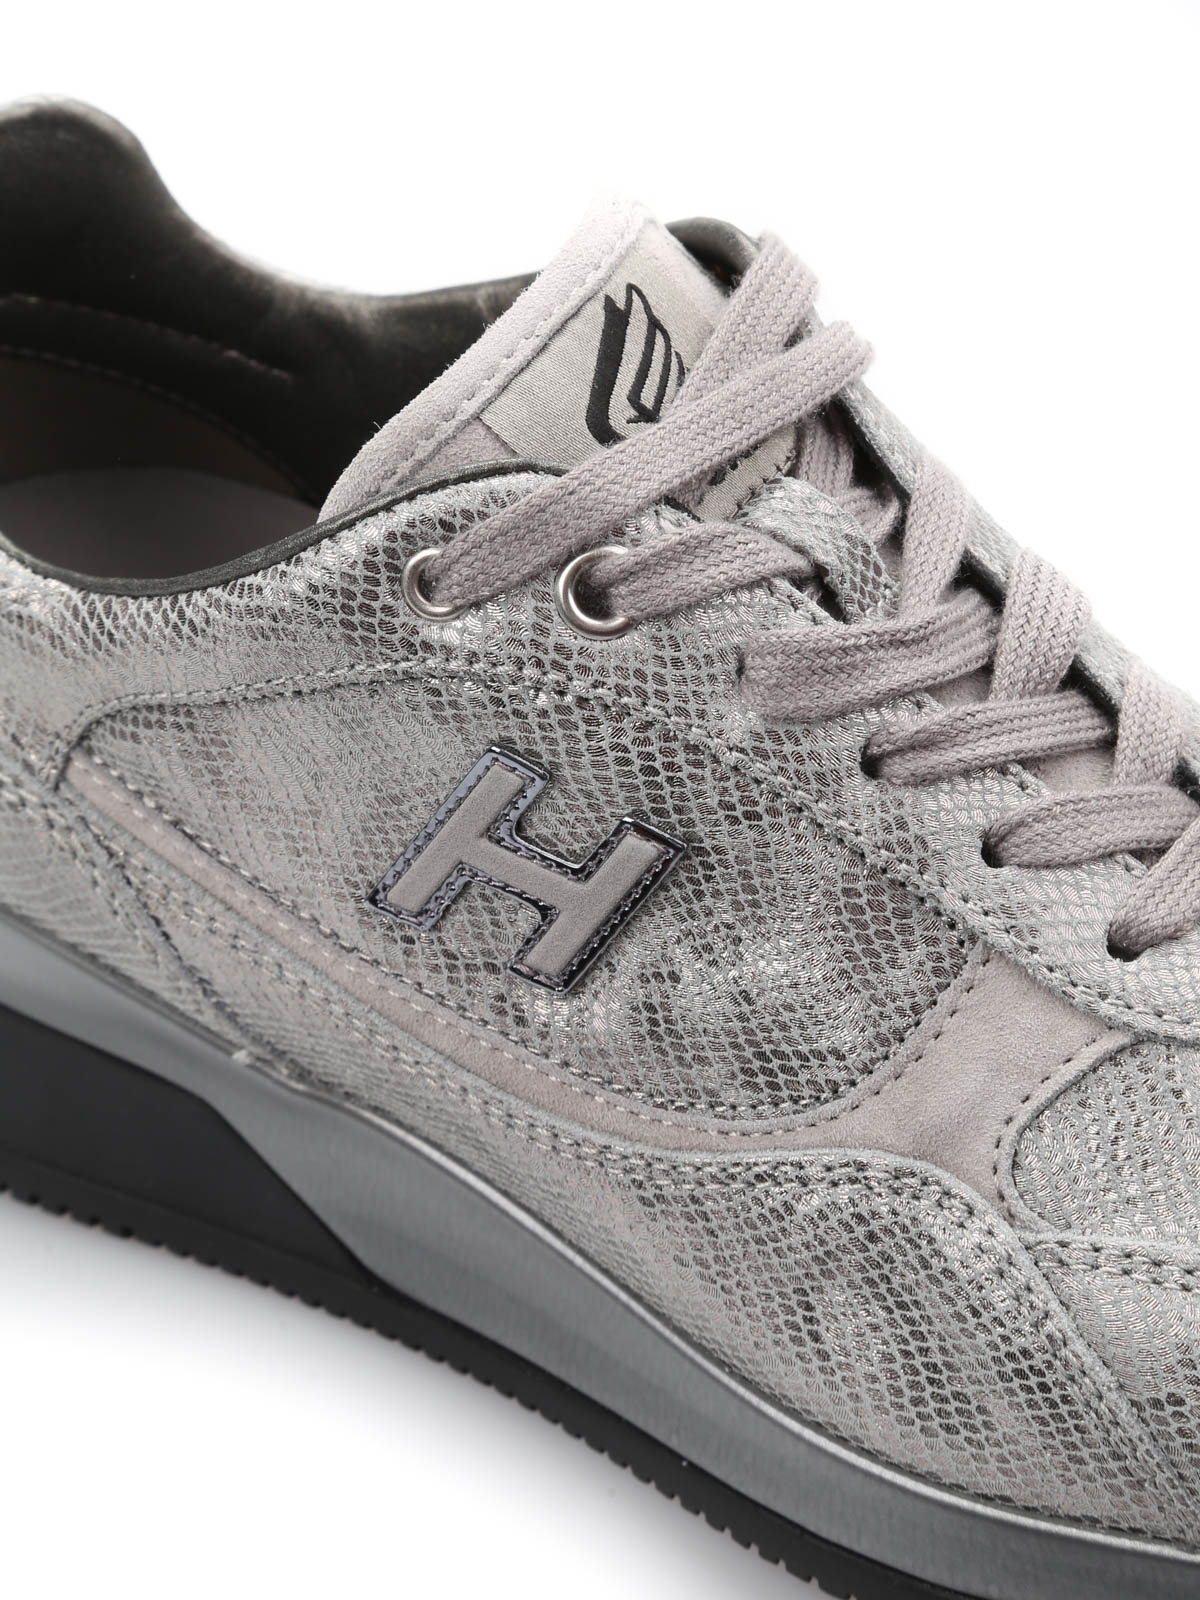 e127fcd551 Hogan - Elective sneakers - trainers - HXW1580A3217YM B606   iKRIX.com